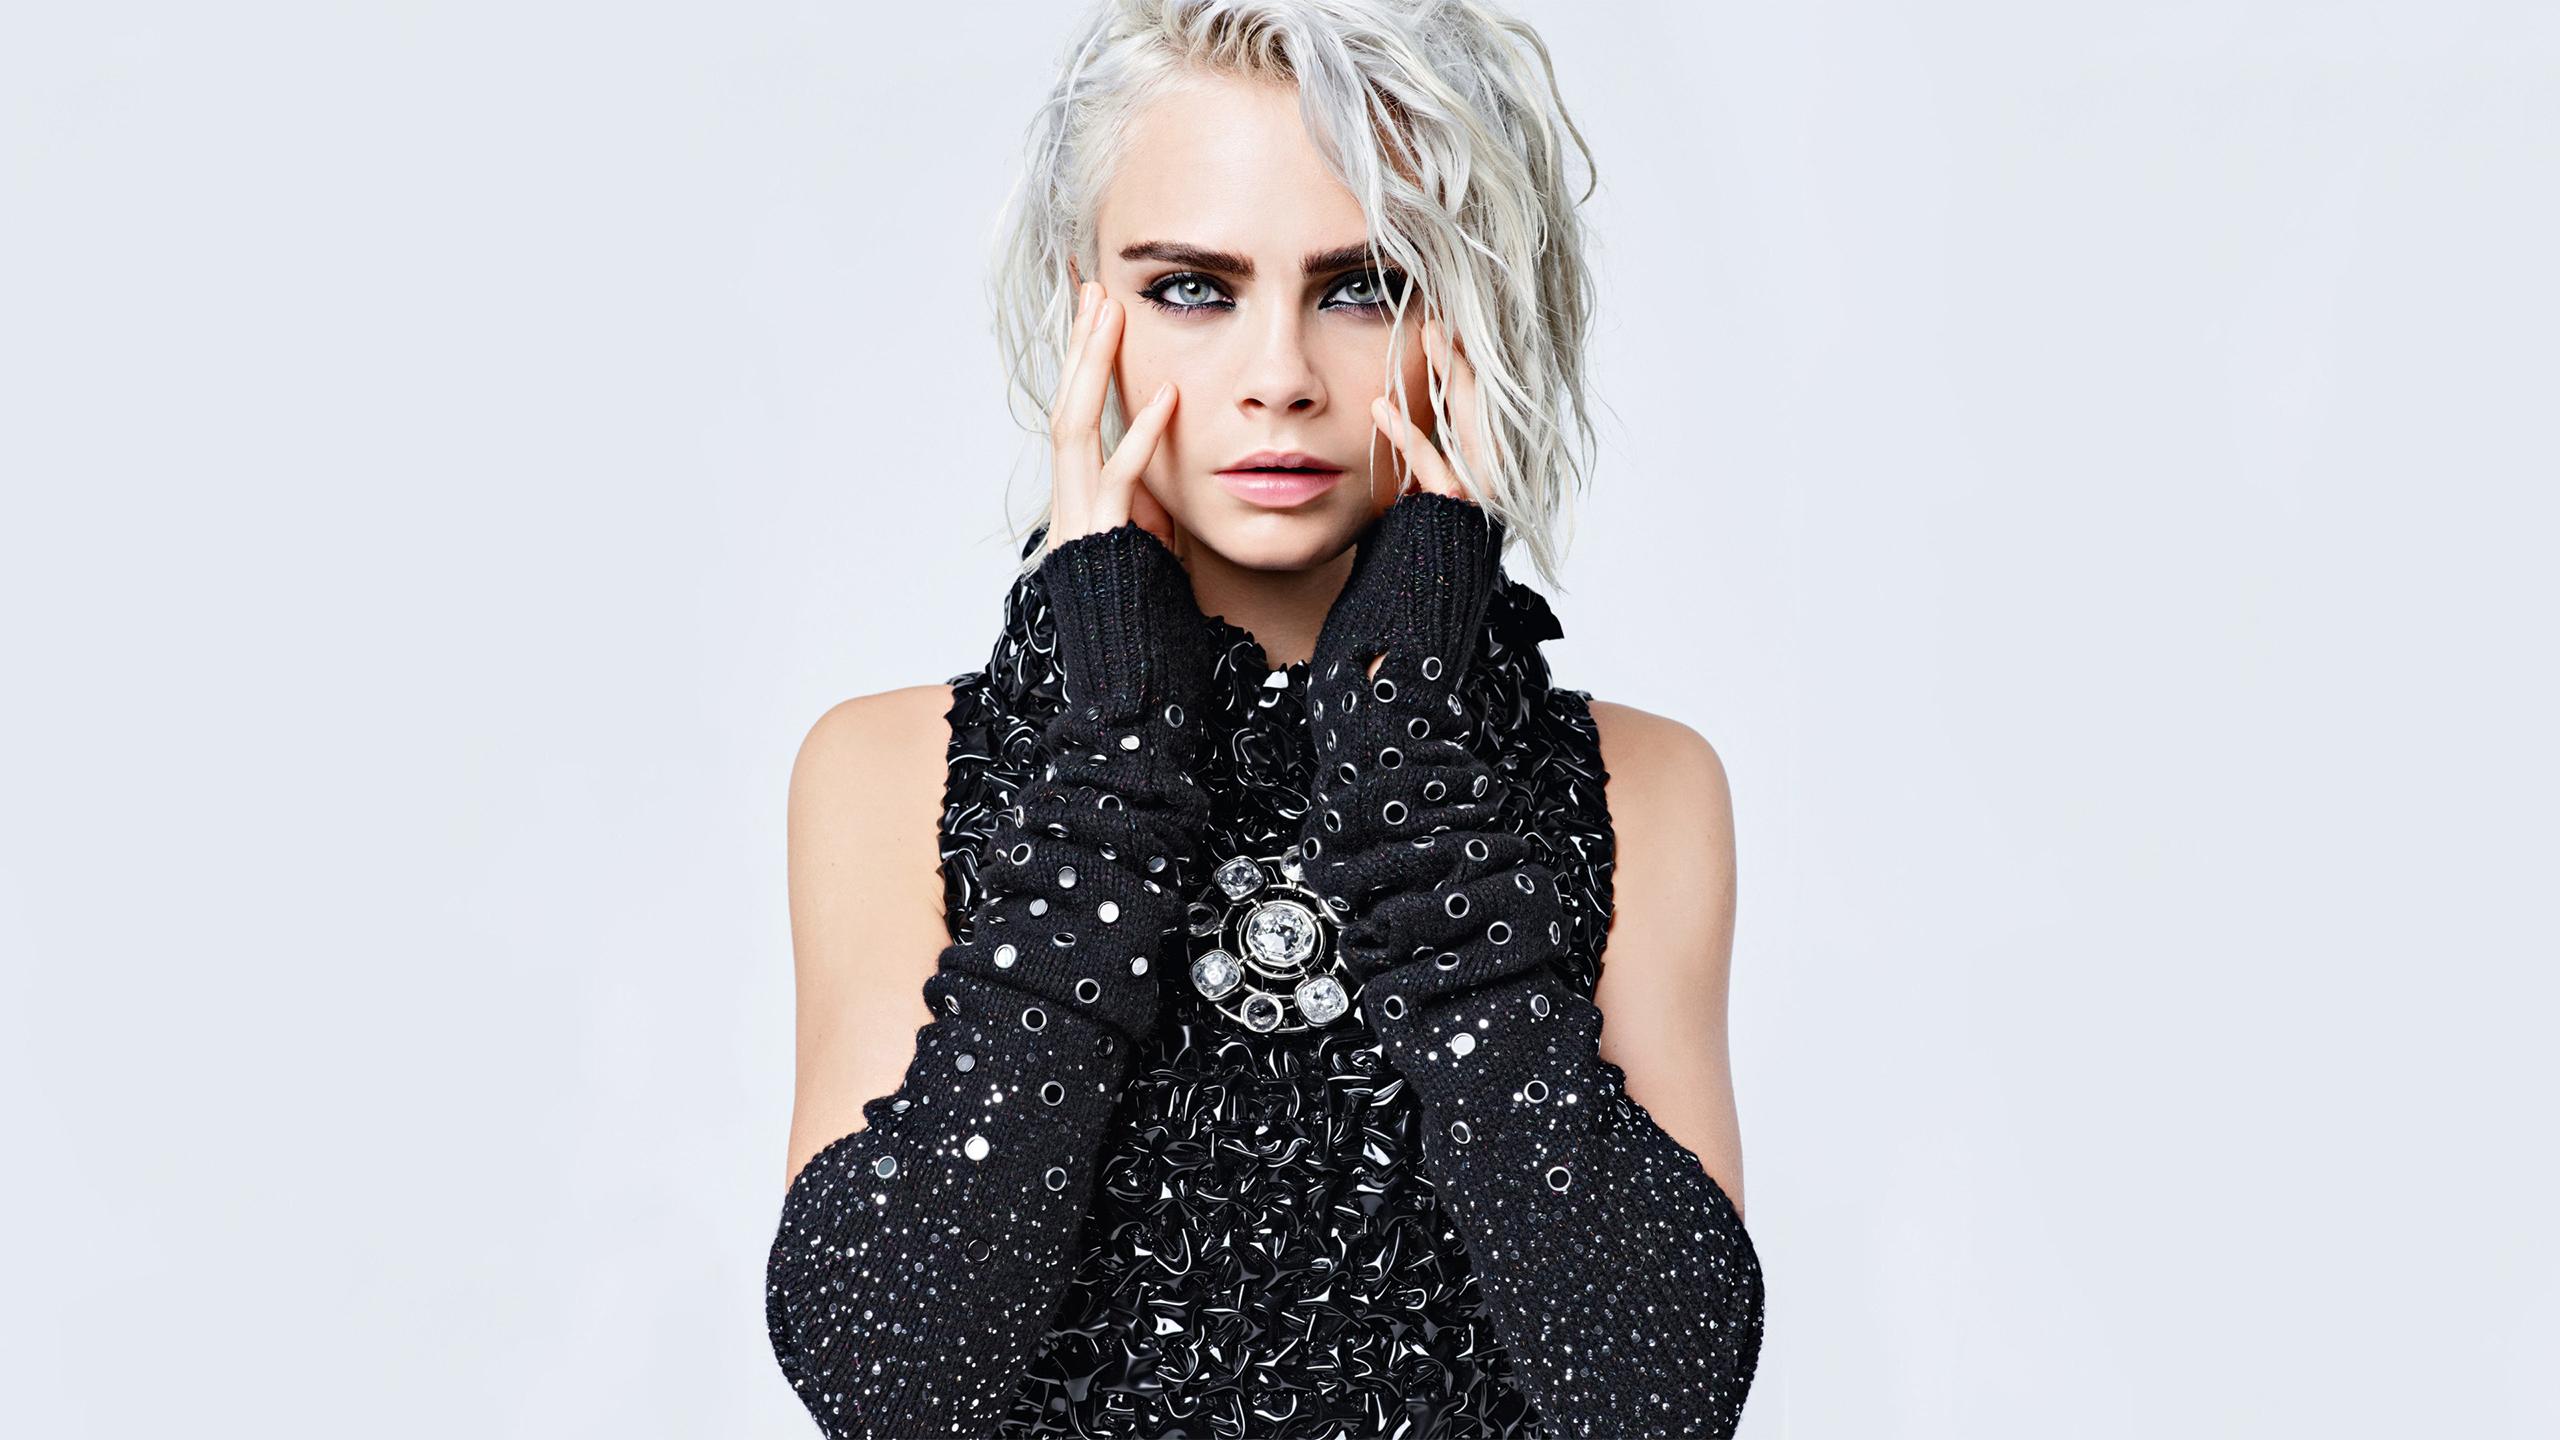 2018 Lily Rose Depp Hd Celebrities 4k Wallpapers Images: Cara Delevingne Lily Rose Depp Chanel 2017, HD Celebrities